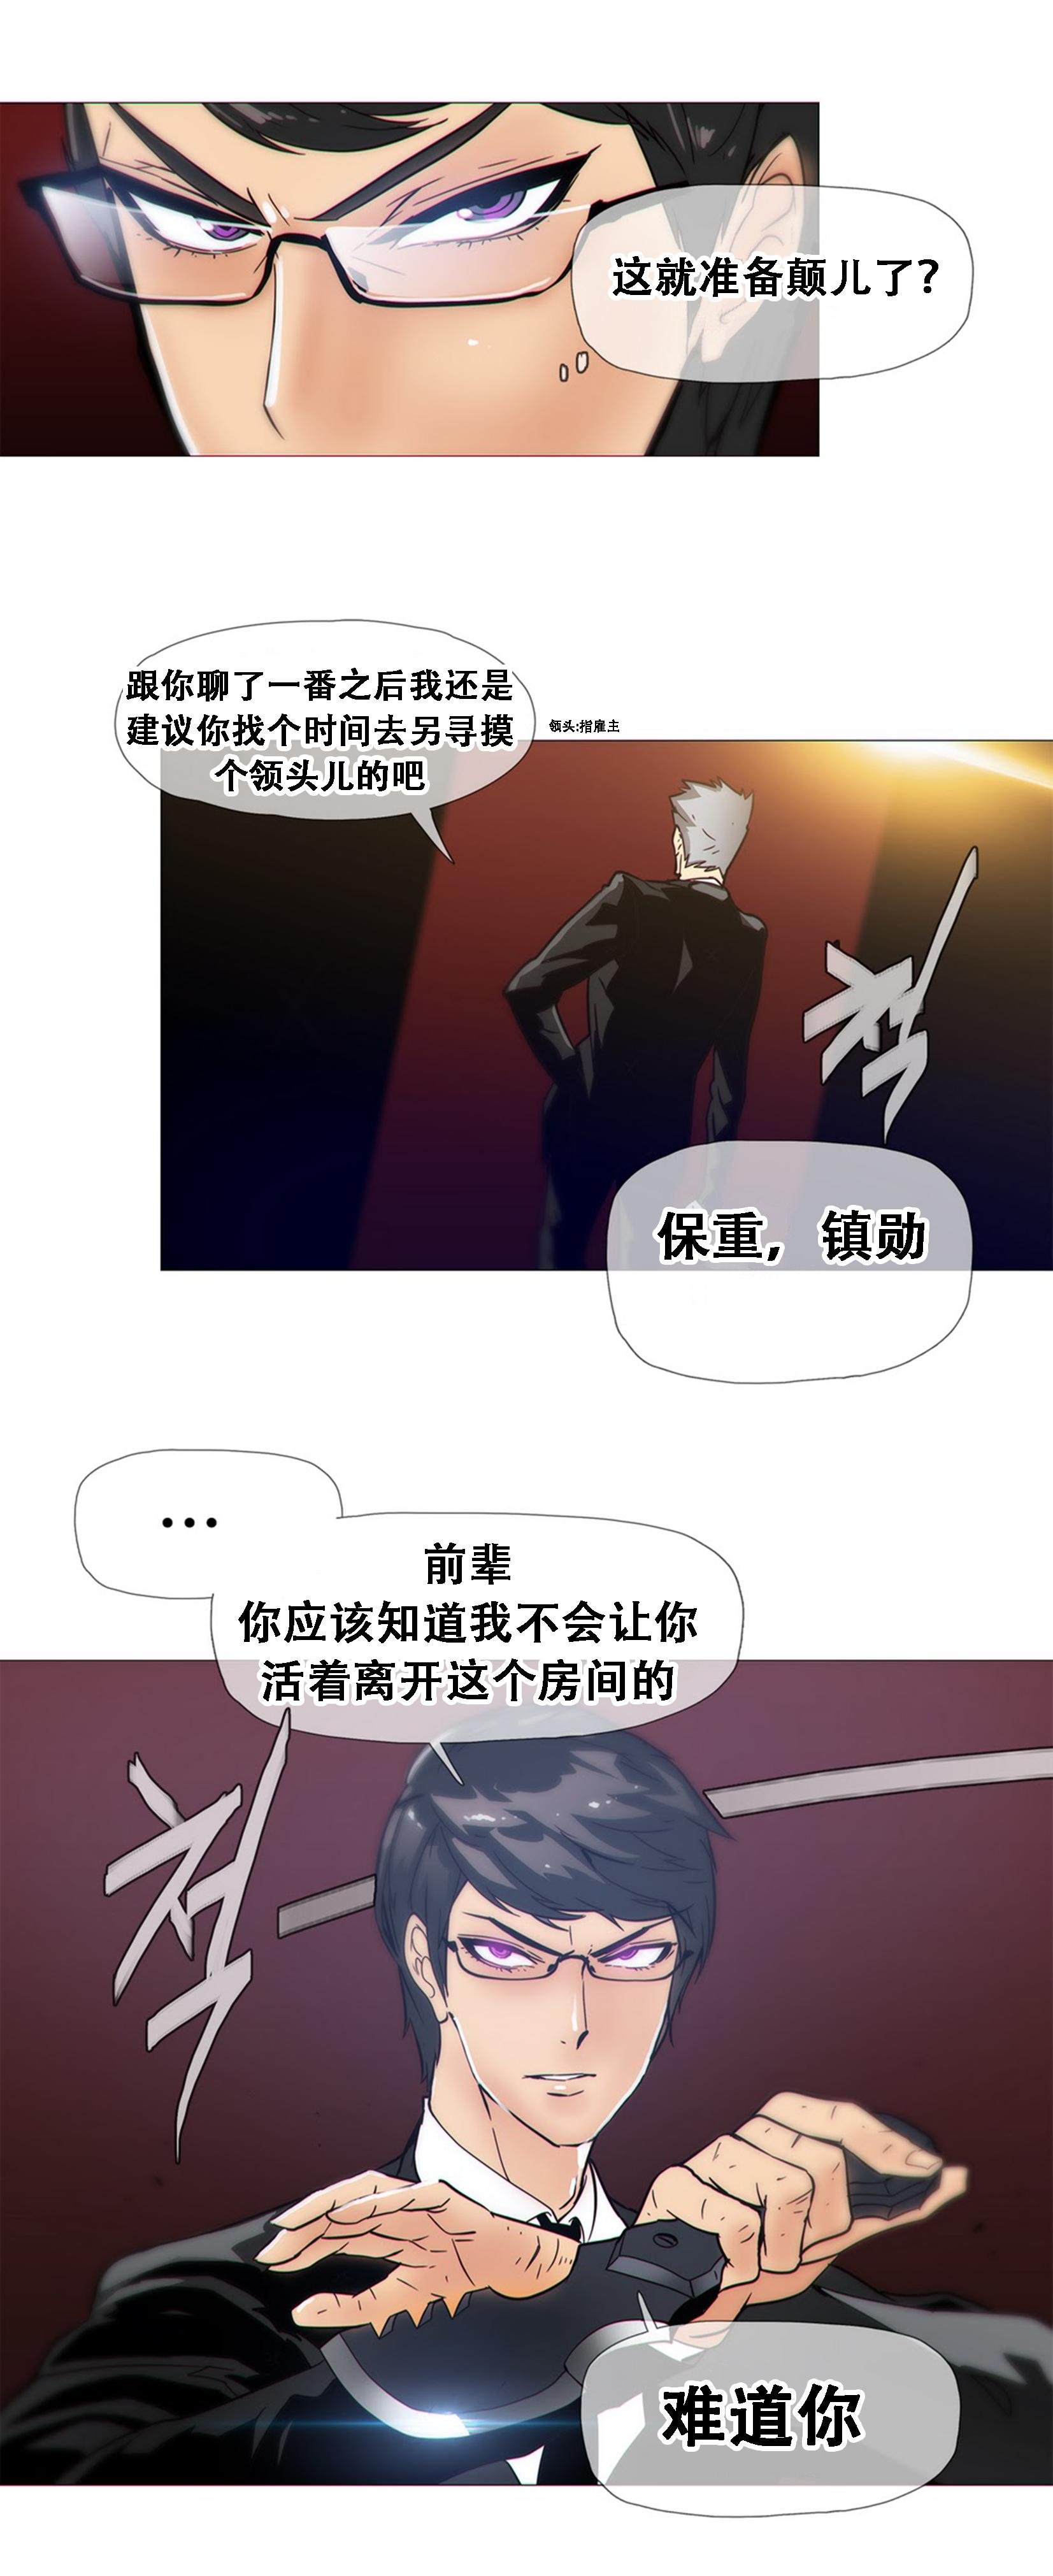 HouseHold Affairs 【卞赤鲤个人汉化】1~21话(持续更新中) 358